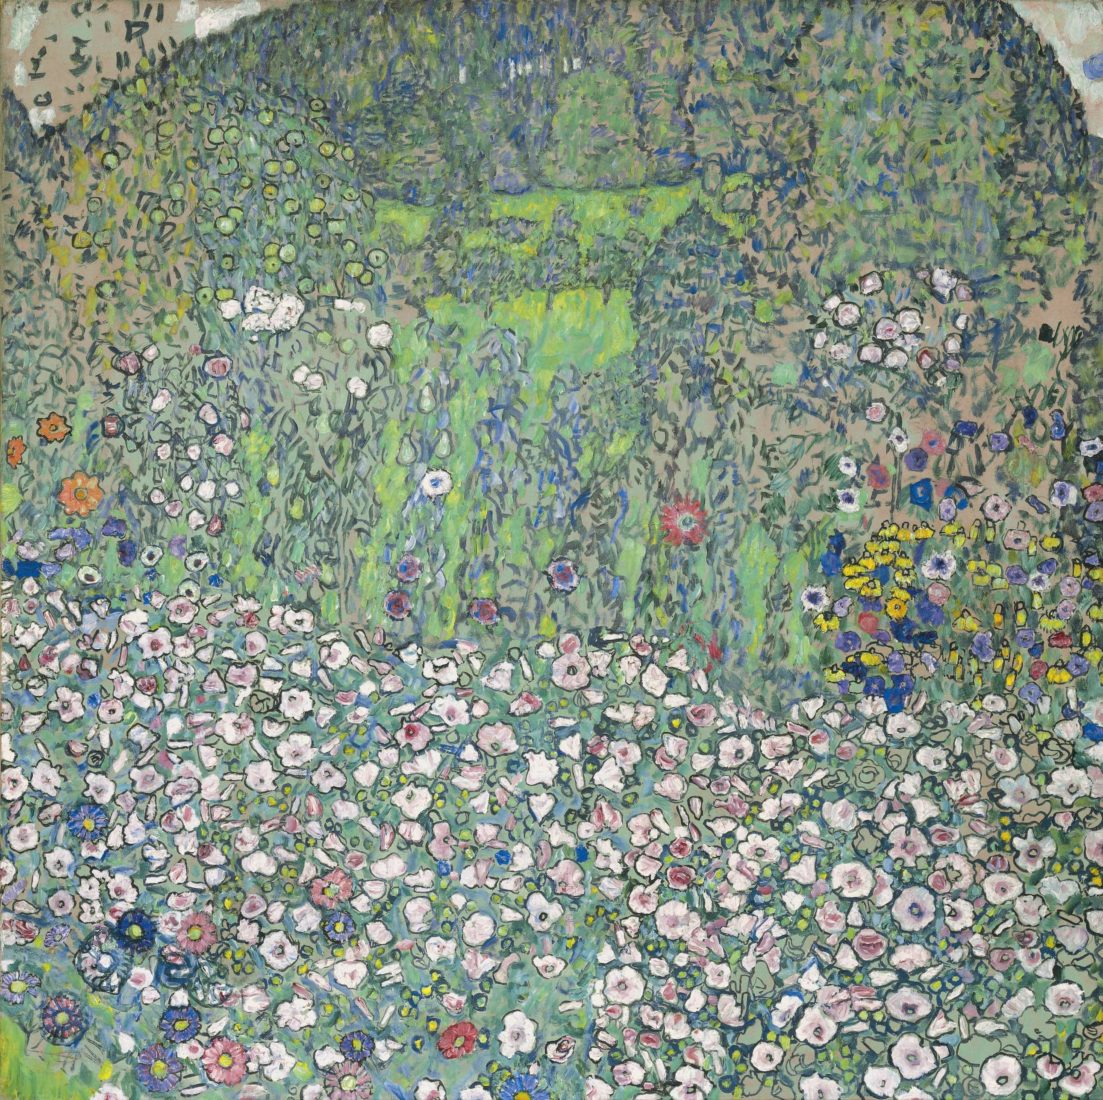 Gustav Klimt (1862-1918) Paysage de jardin avec colline